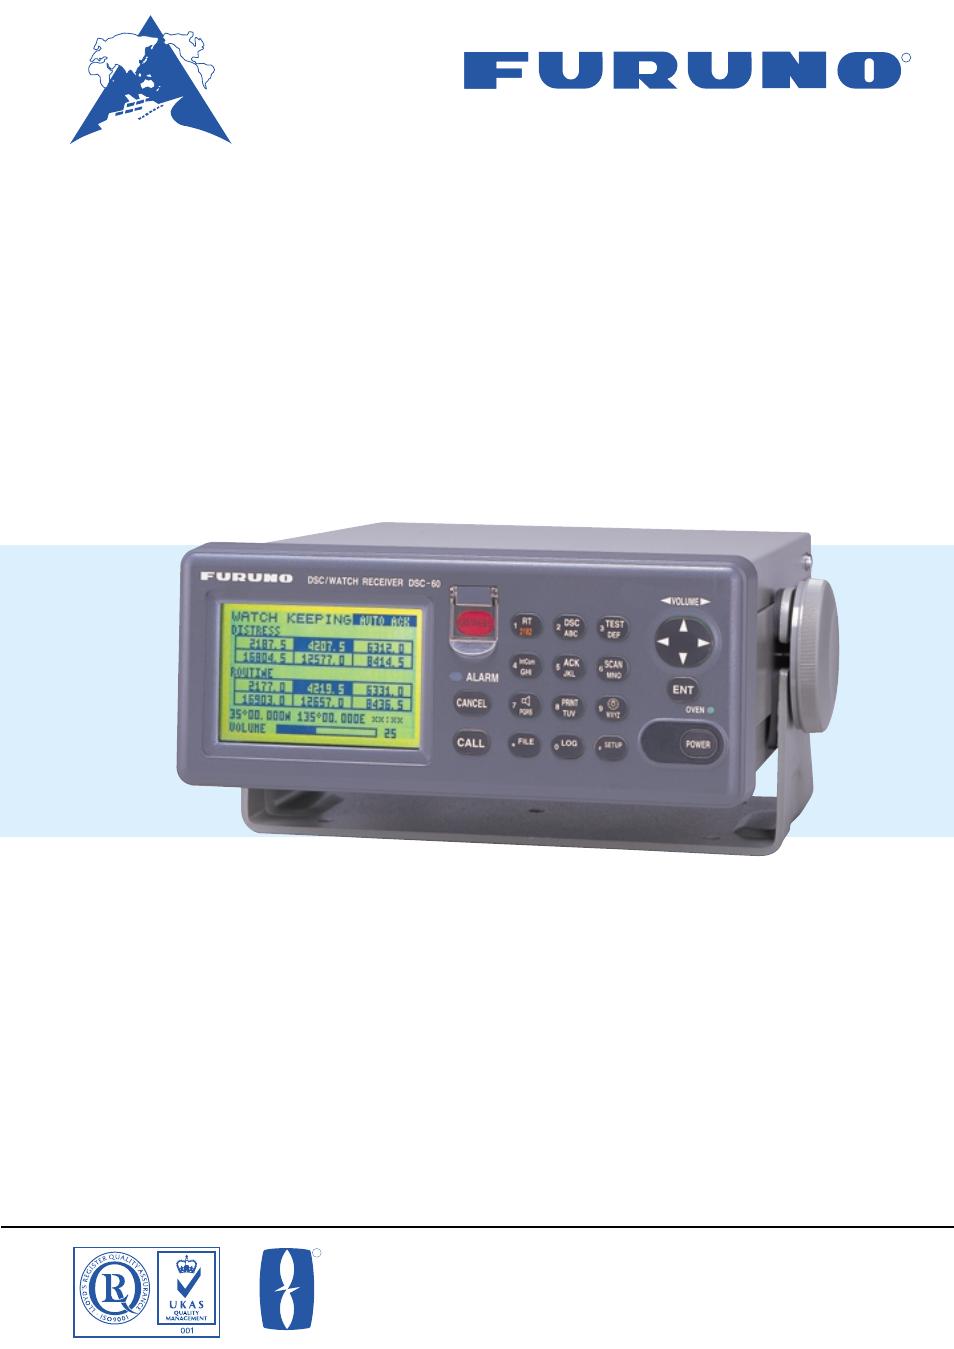 Furuno MF/HF DSC/Watch Receiver DSC-60 User Manual | 2 pages